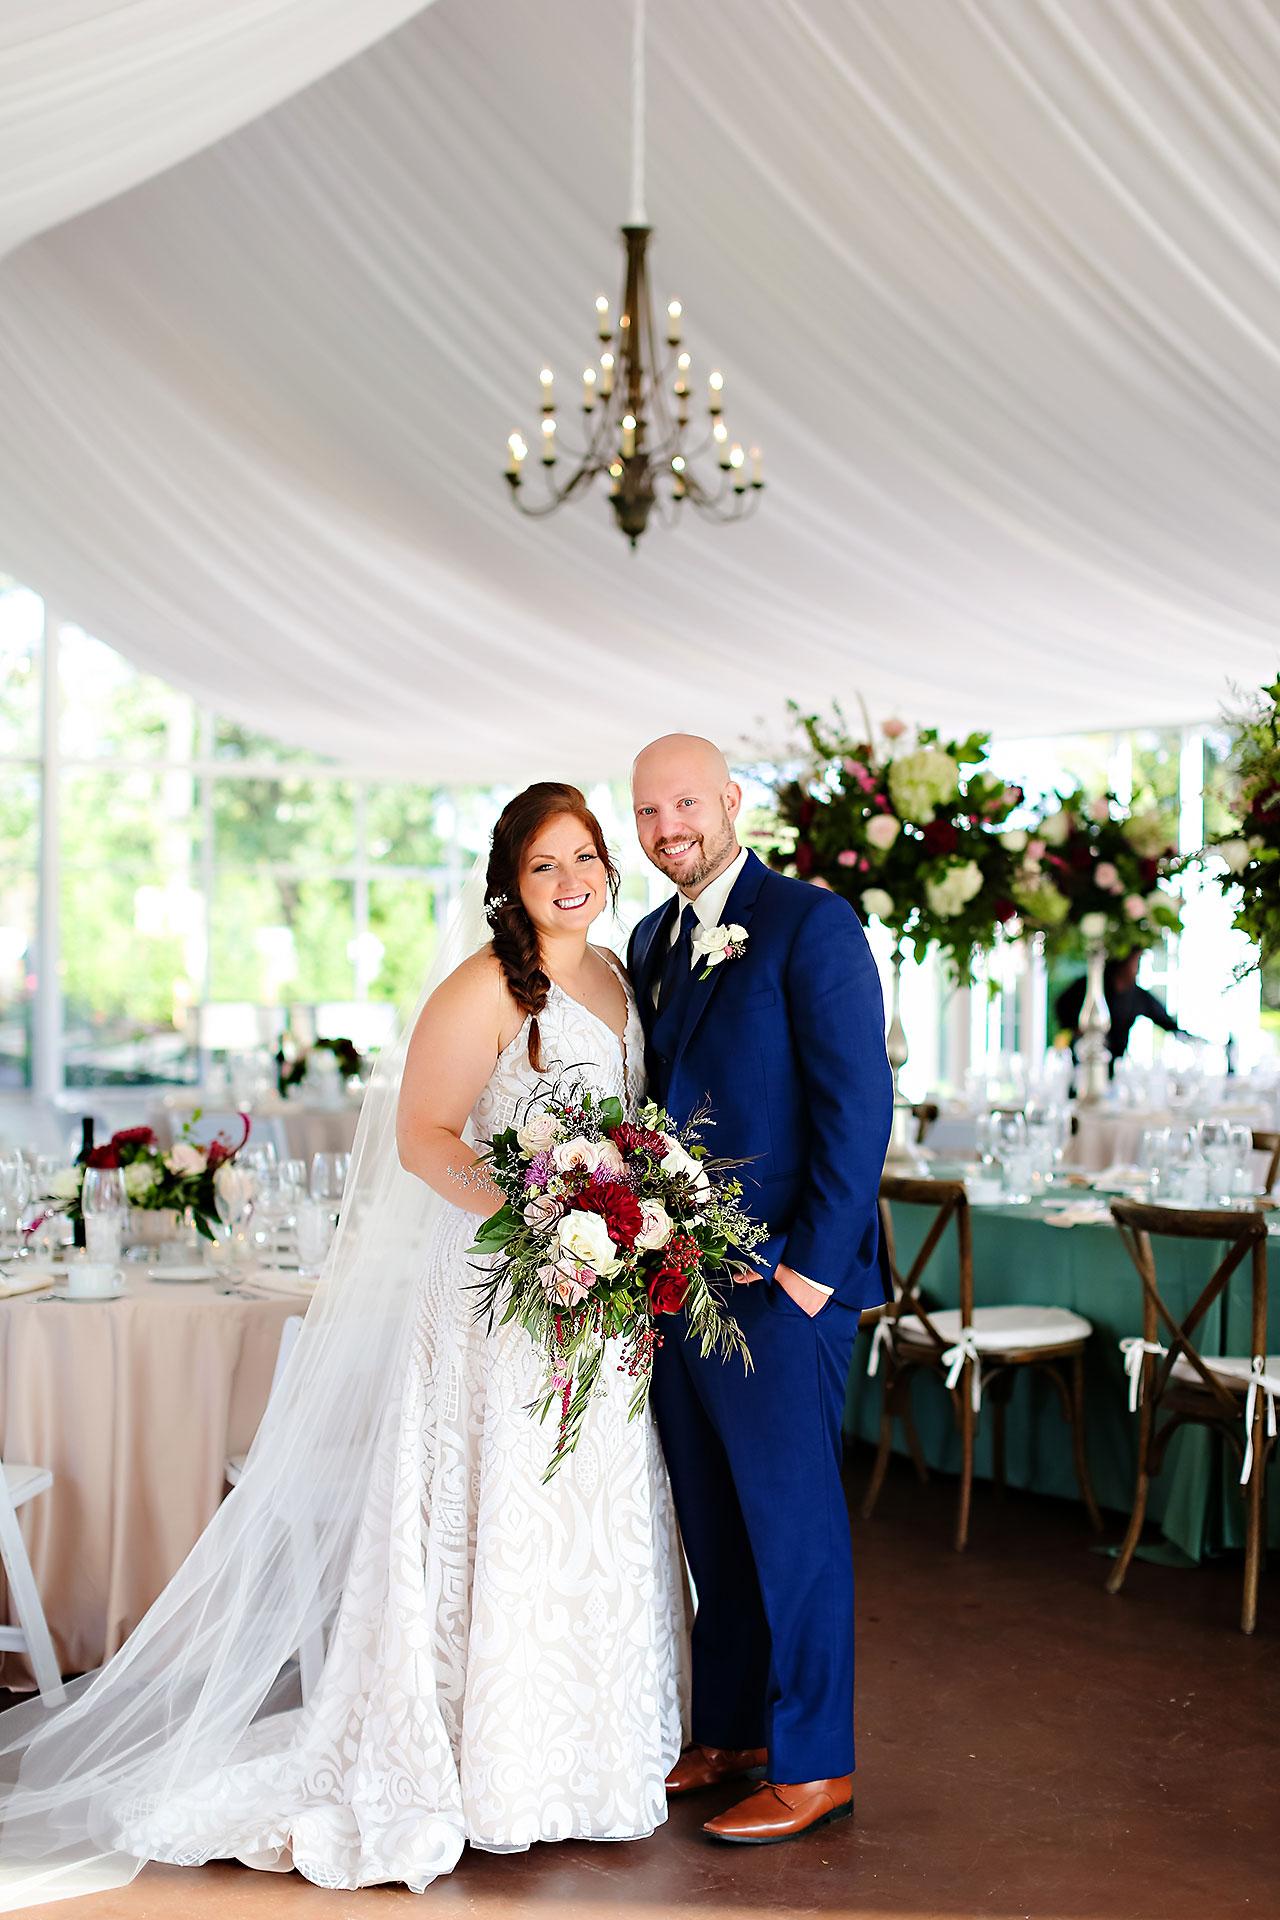 Jen Chris Ritz Charles Garden Pavilion Wedding 251